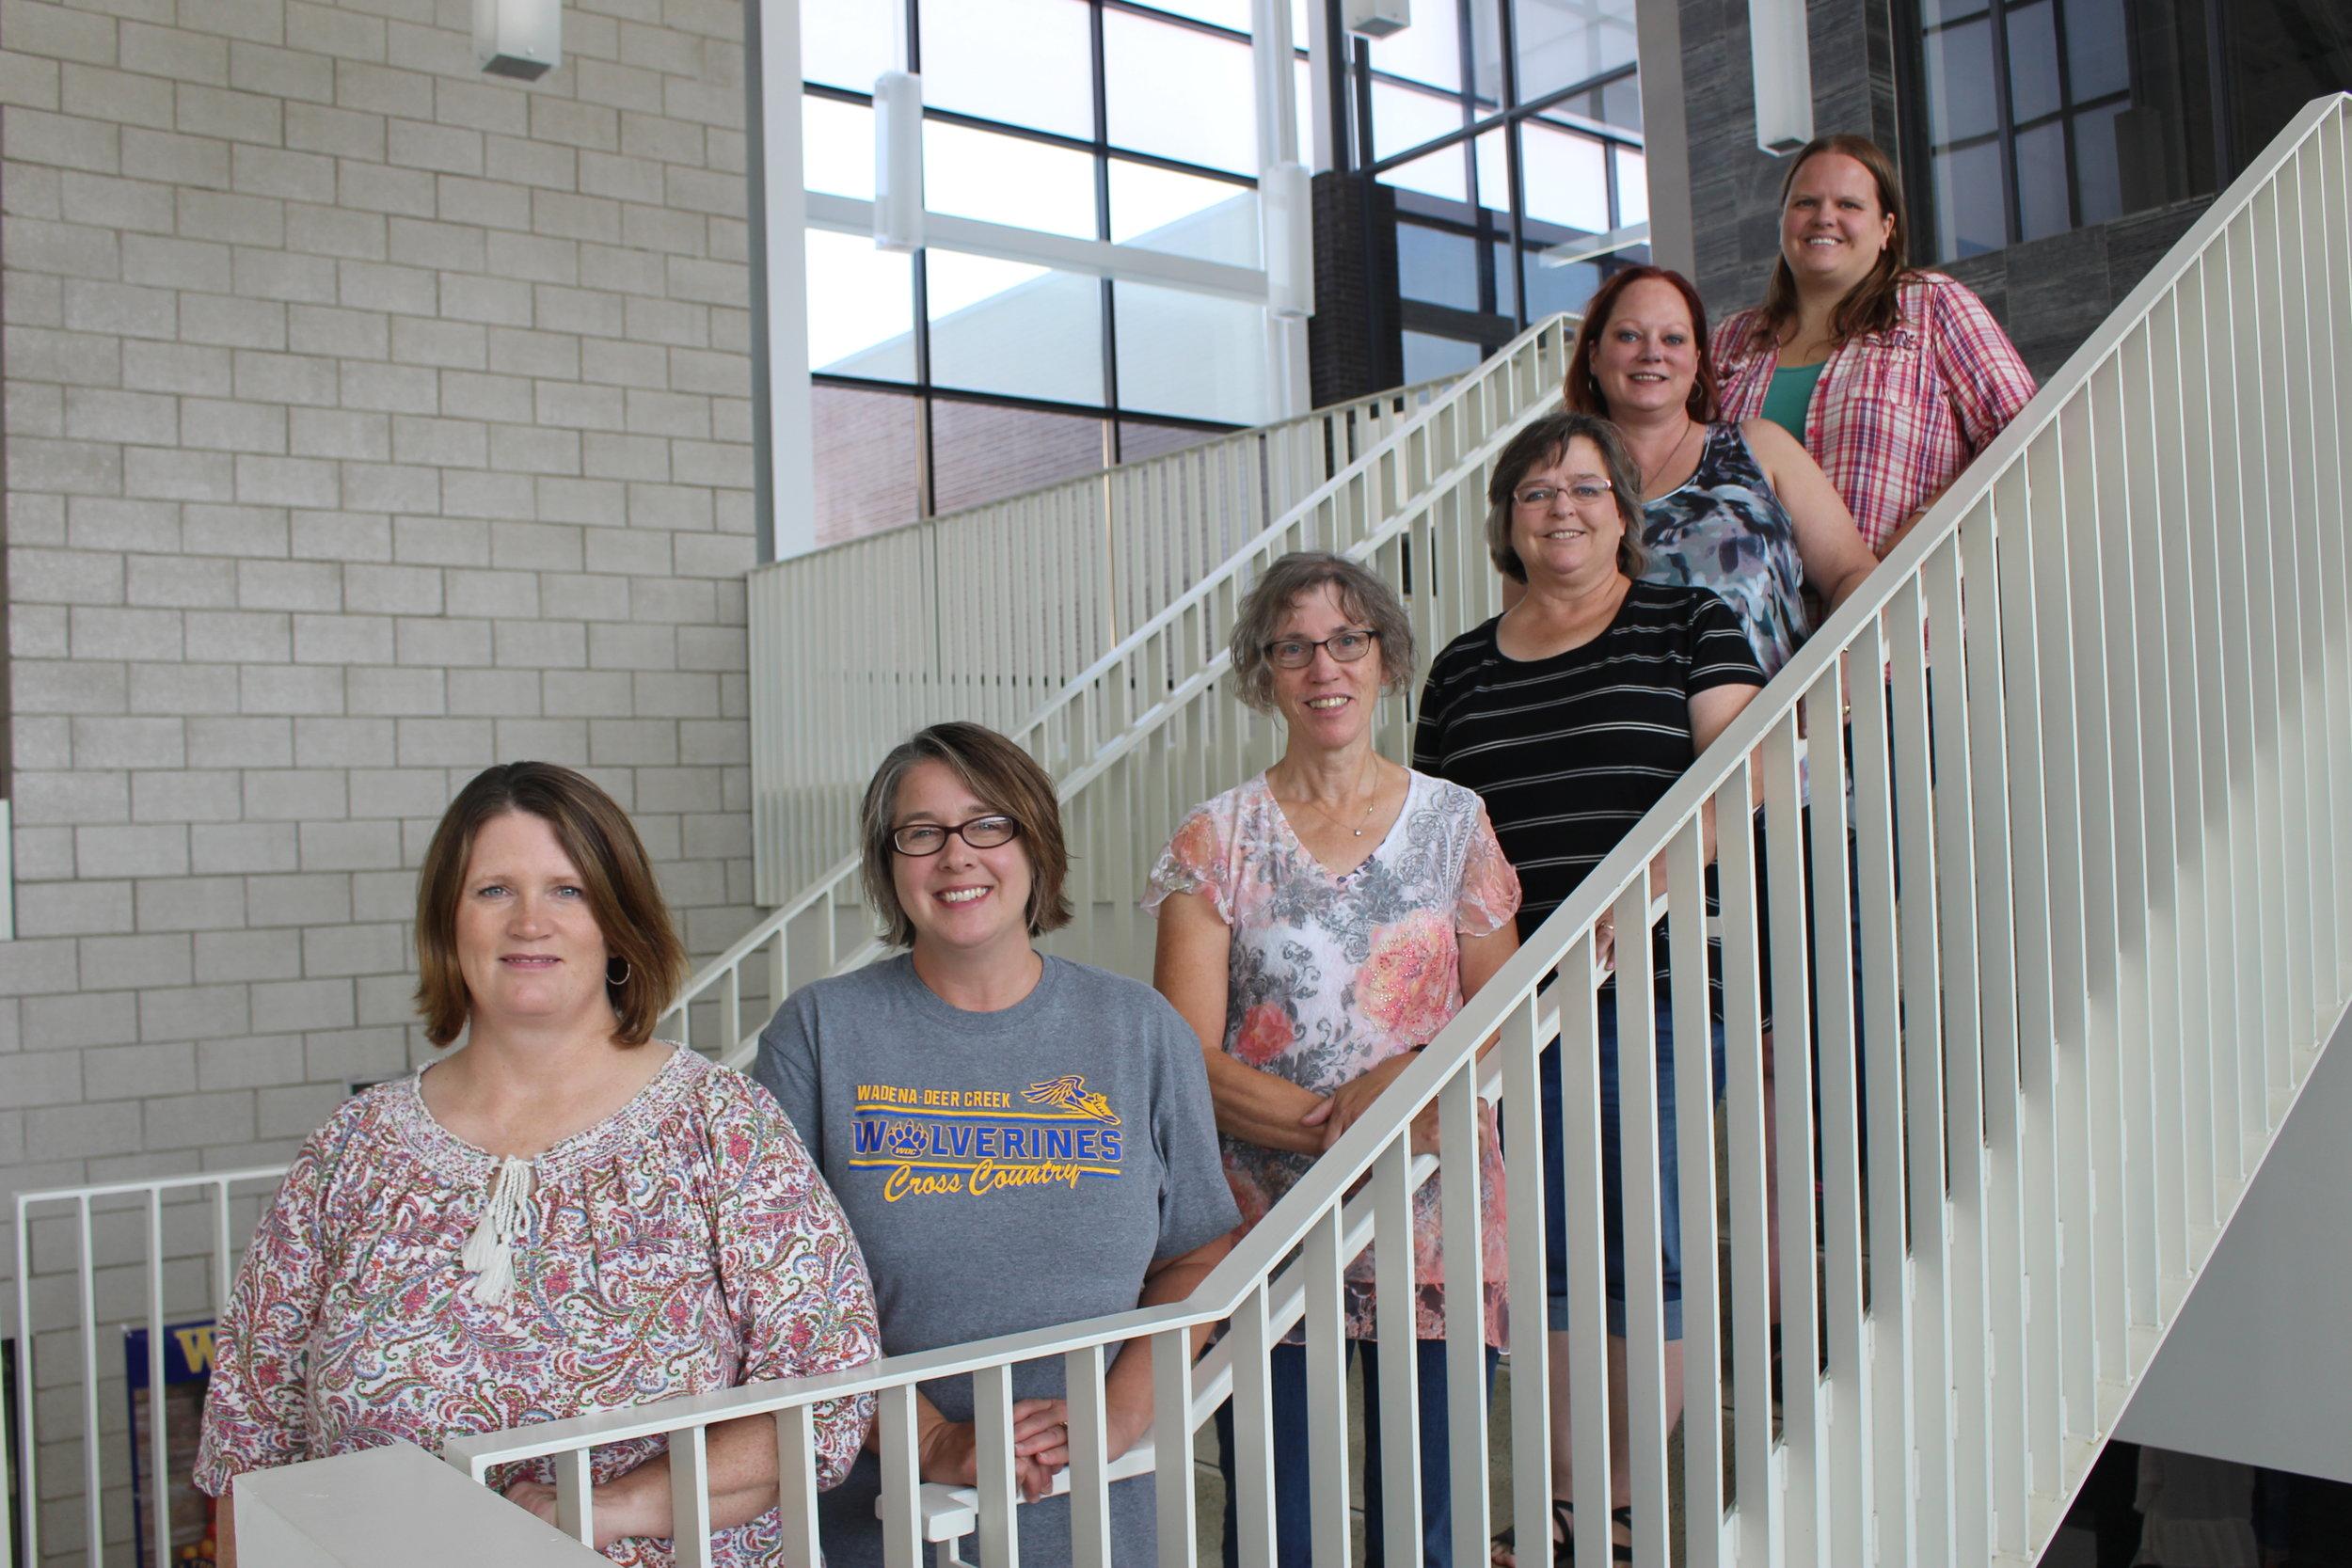 From left, Alicia Johnson, Leanne Ries, Patti Isaacson, Jan Bernu, Deb Fitzsimmons and Sarah Steinkopf.